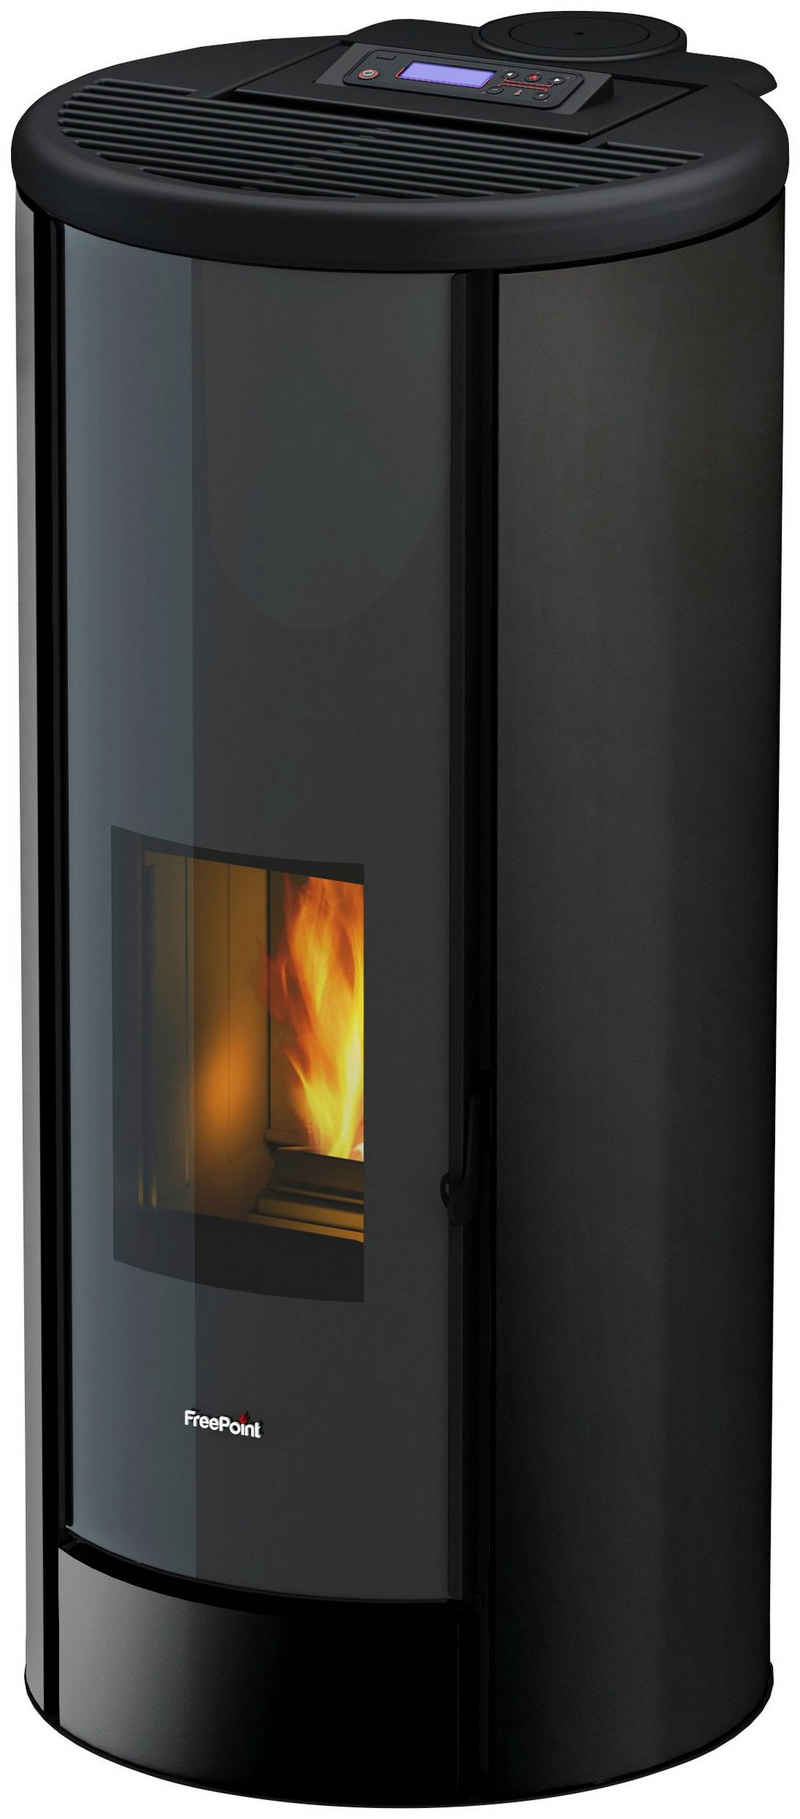 Freepoint Pelletofen »BREEZE«, 9,1 kW, Zeitbrand, Stahl, integrierte WIFI-Funktion